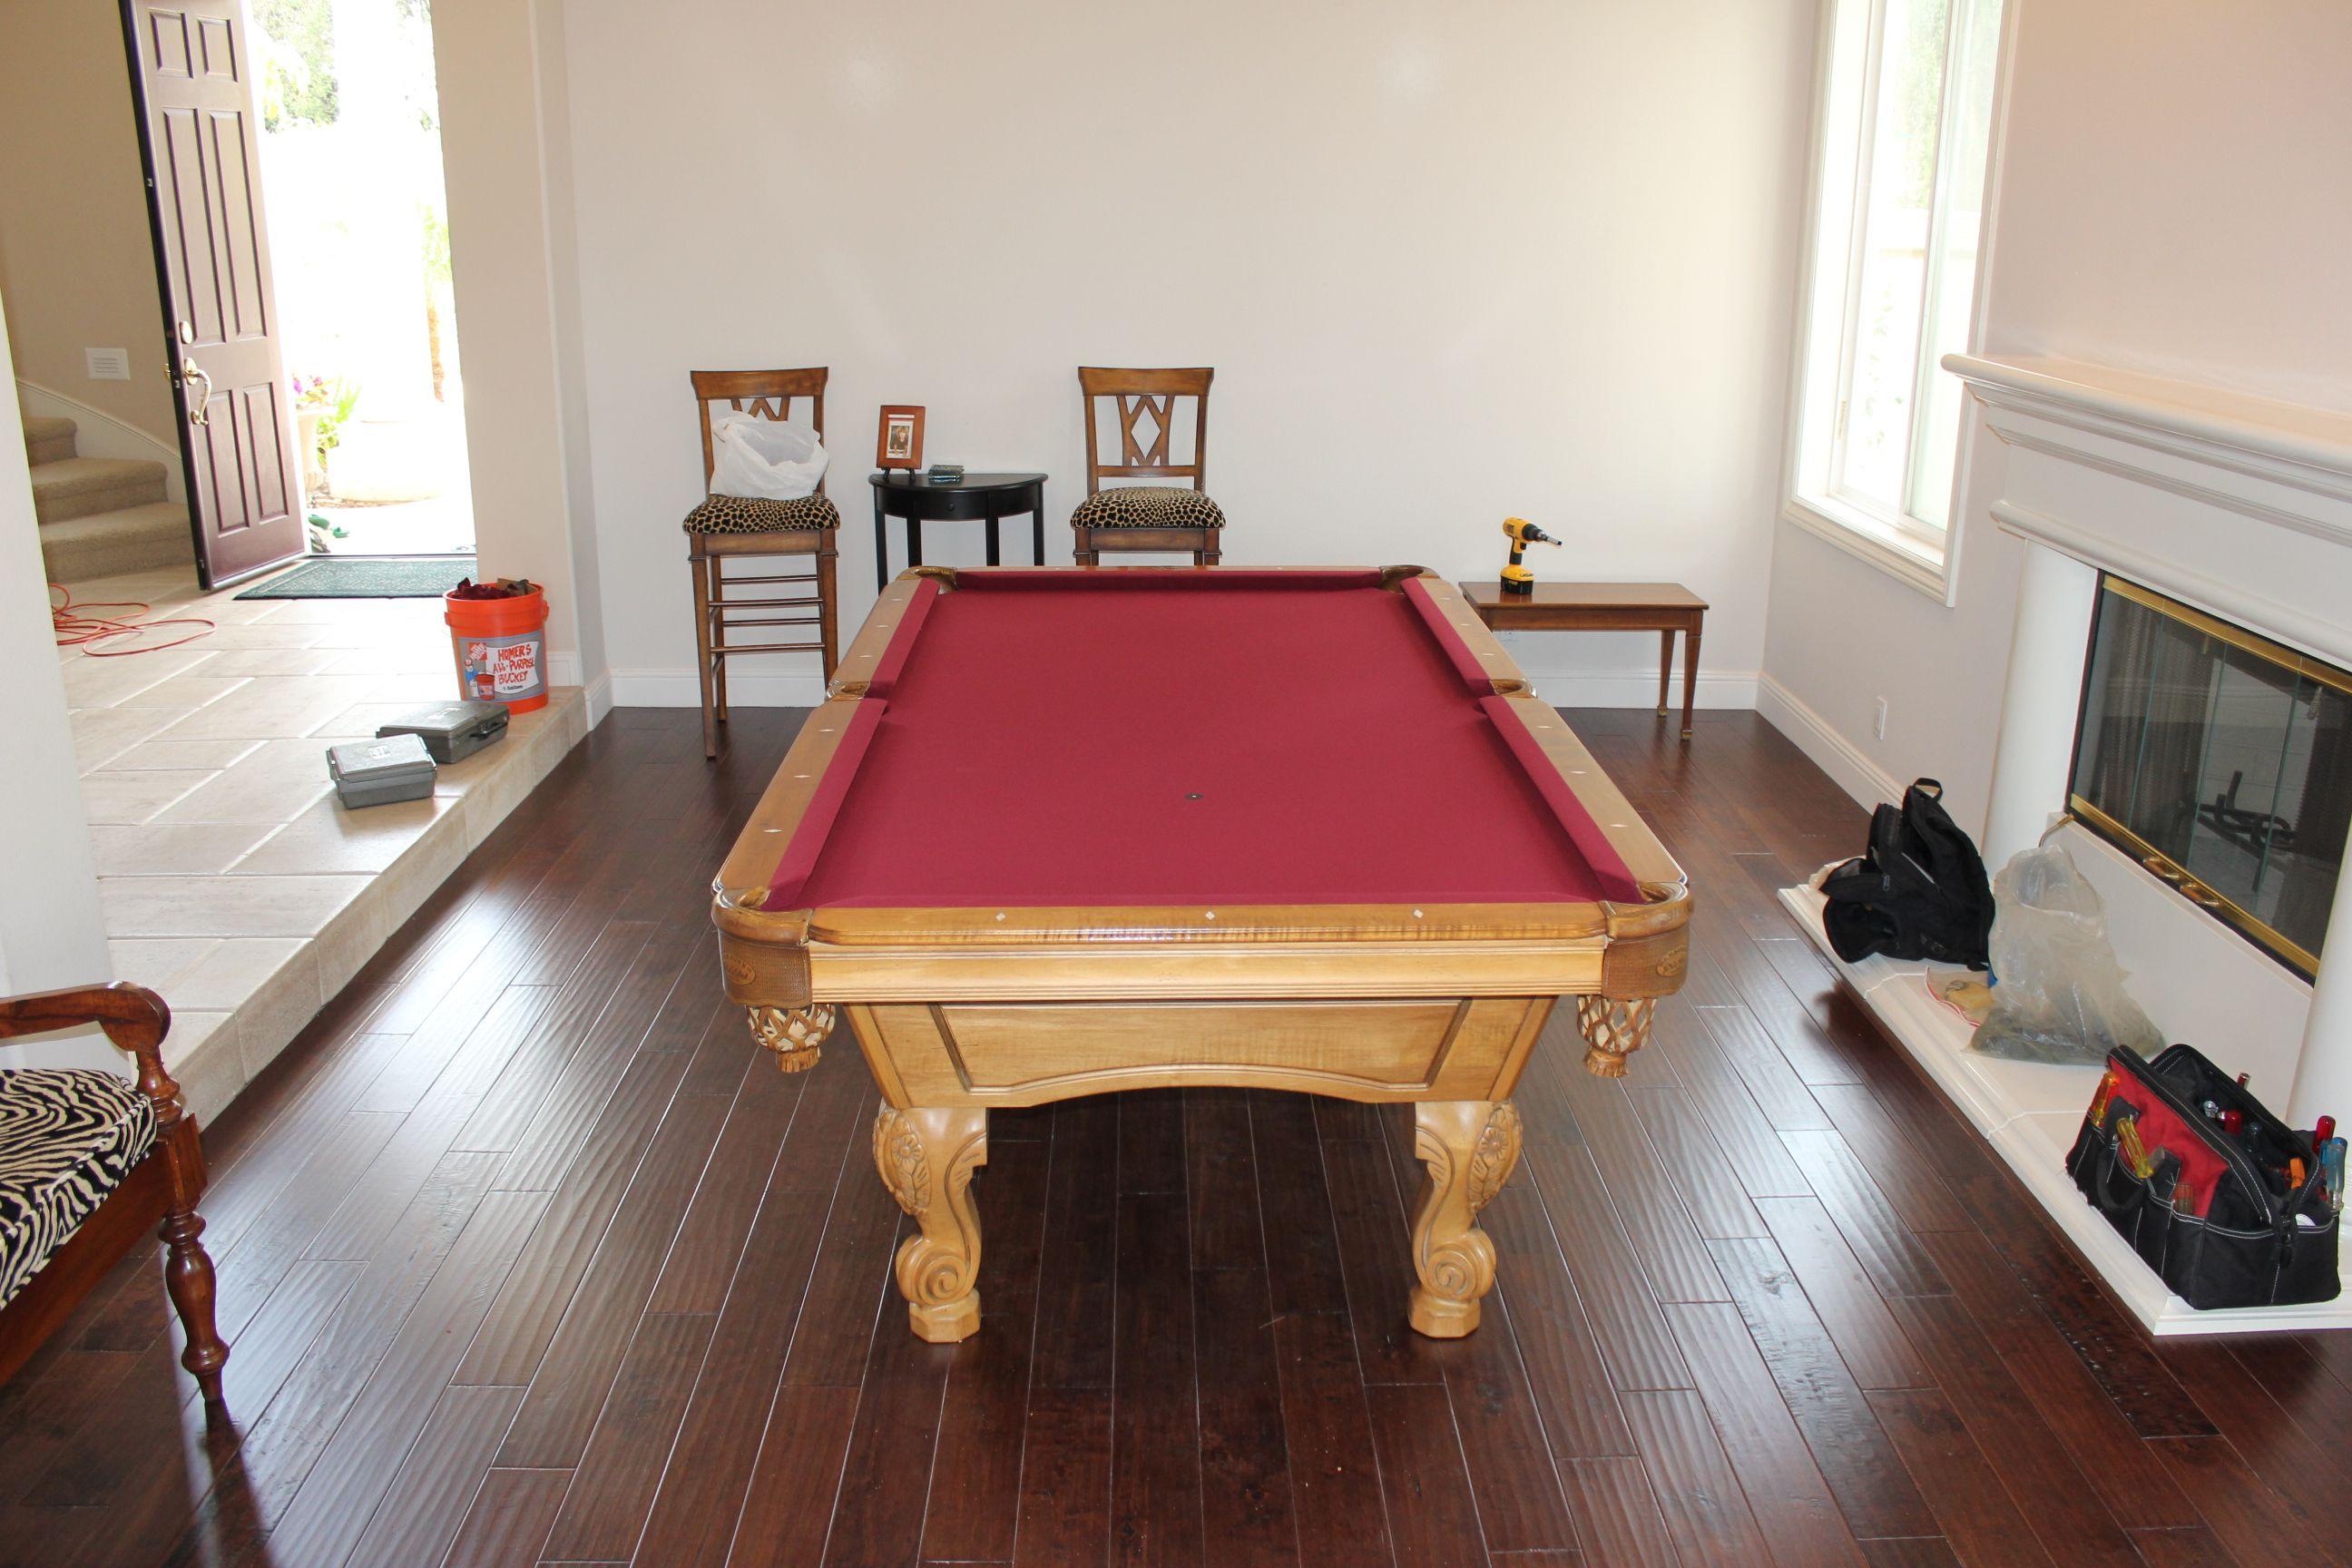 Olhausen Pool Table Refelting Olhausen pool table